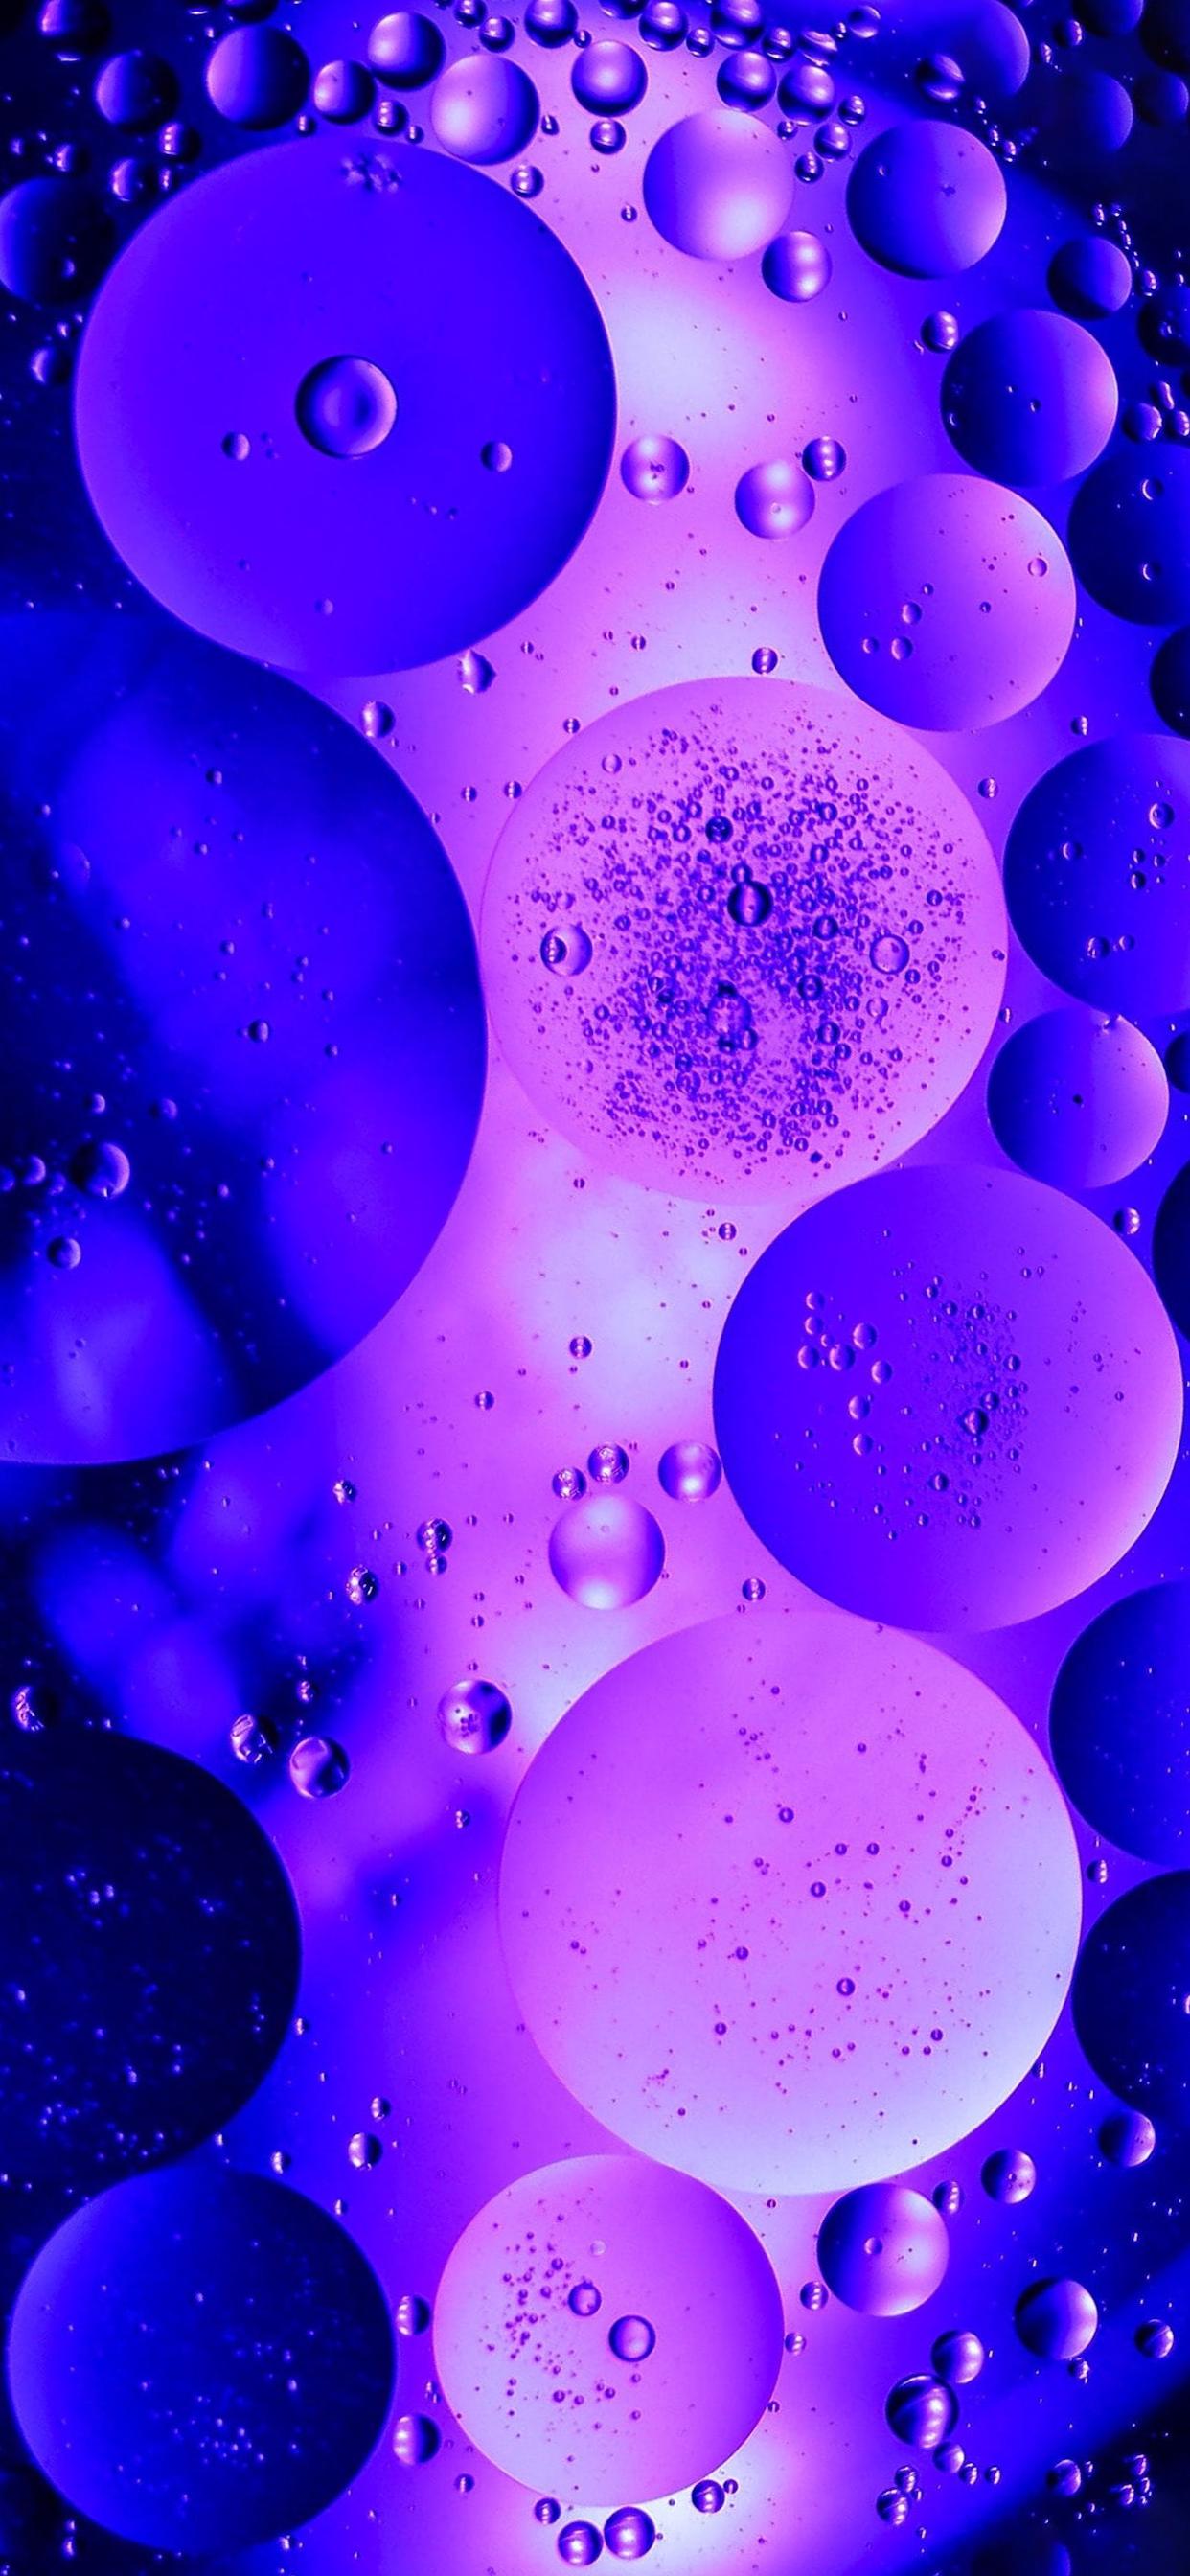 iPhone wallpapers abstract bubbles pink blue Fonds d'écran iPhone du 04/03/2020